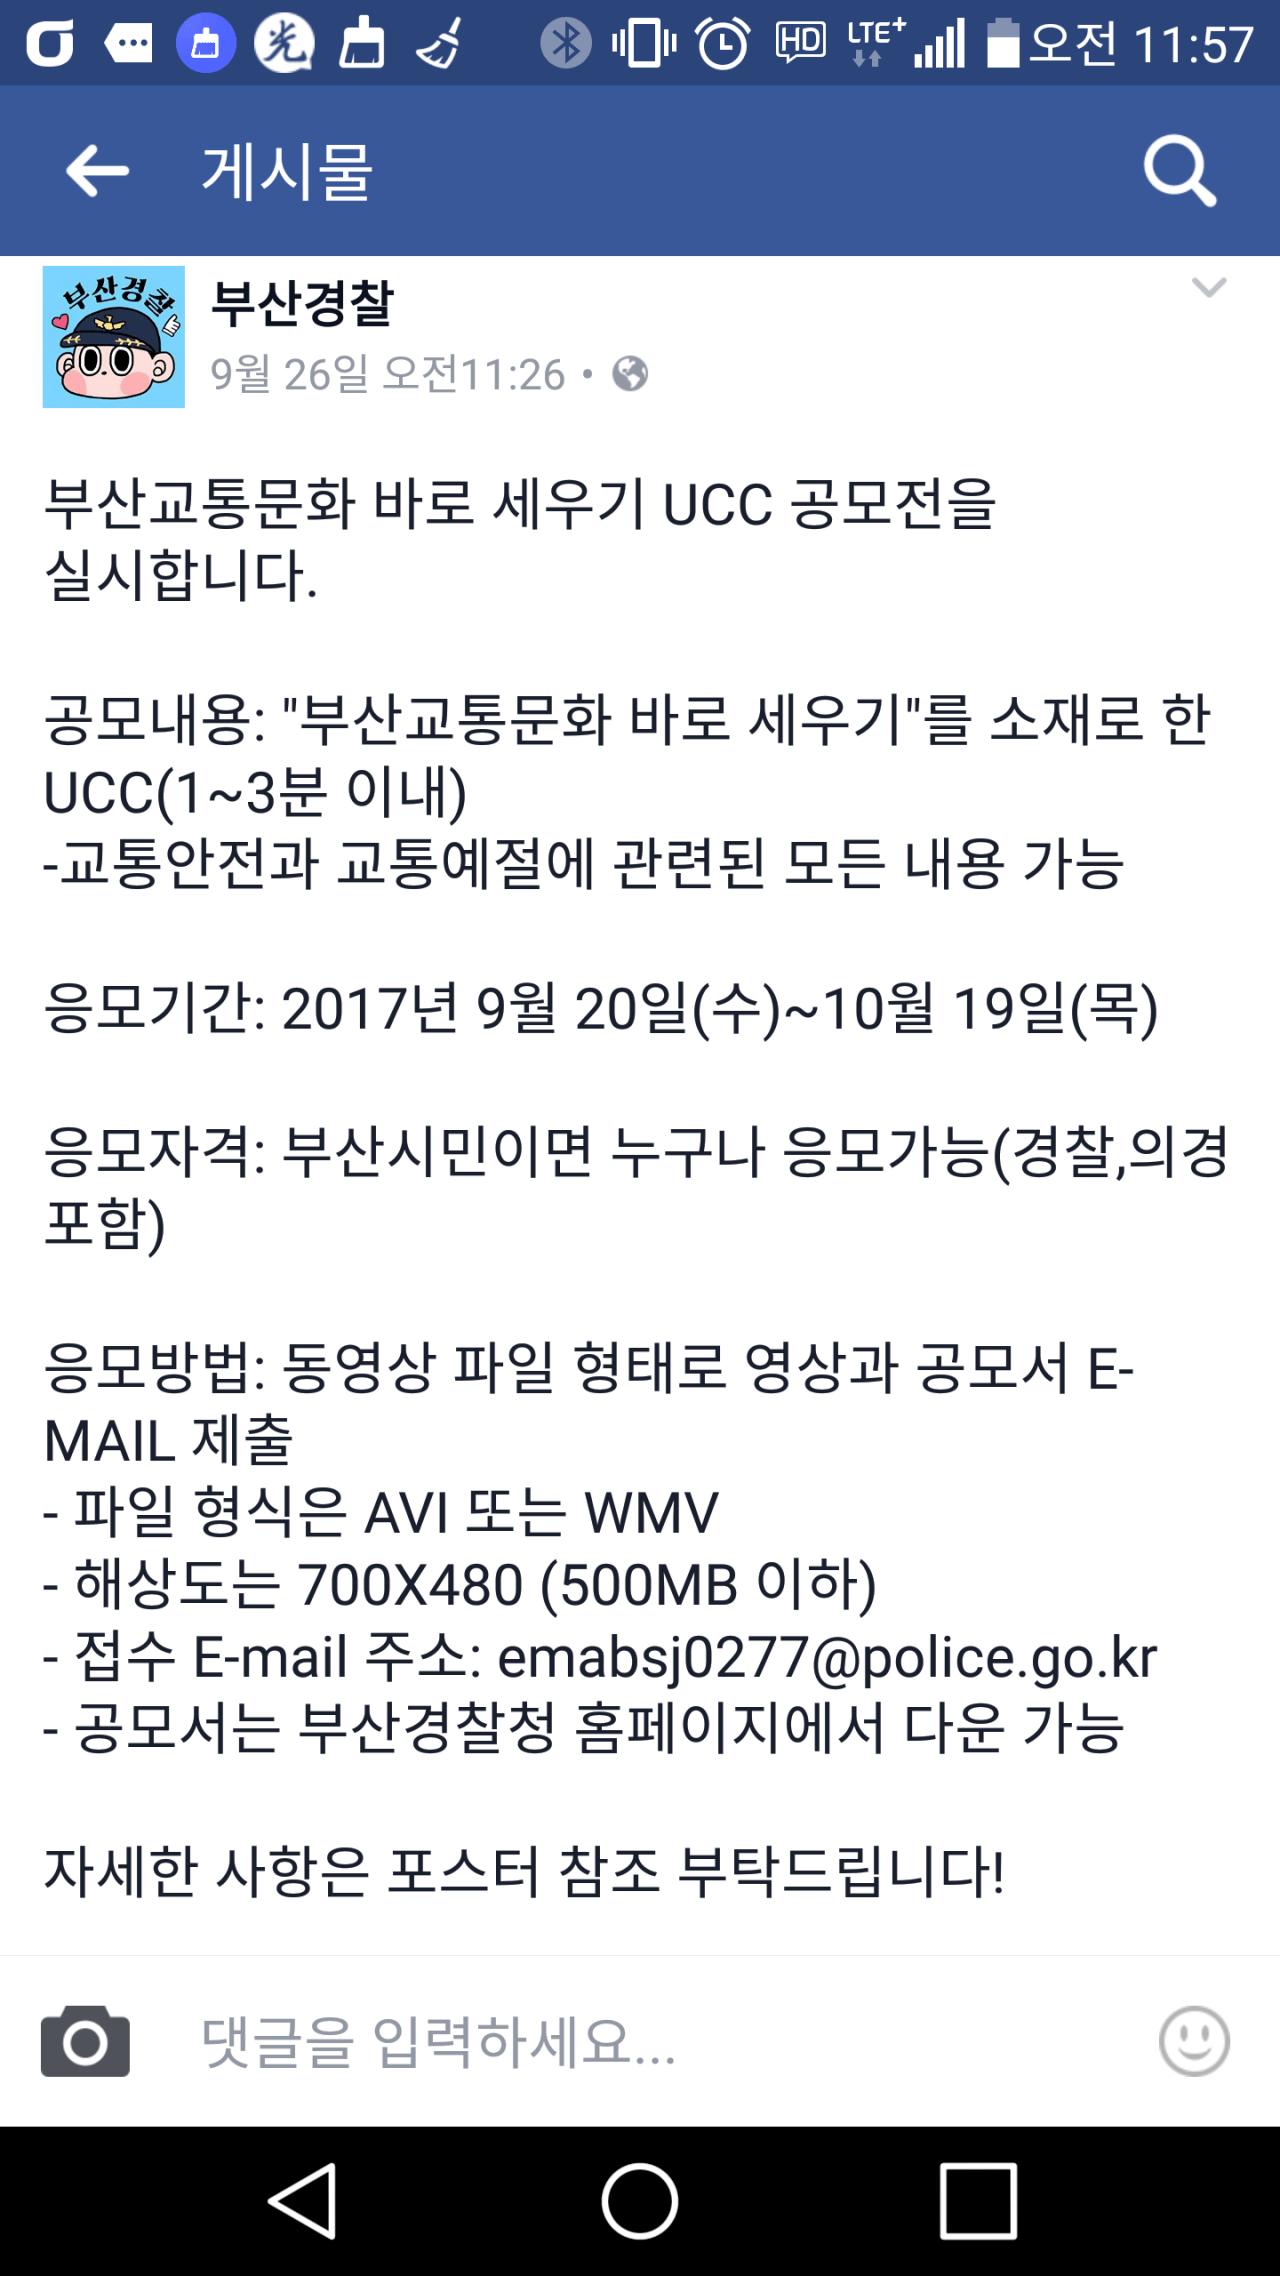 Screenshot_2017-10-04-11-57-28.png 부산경찰근황